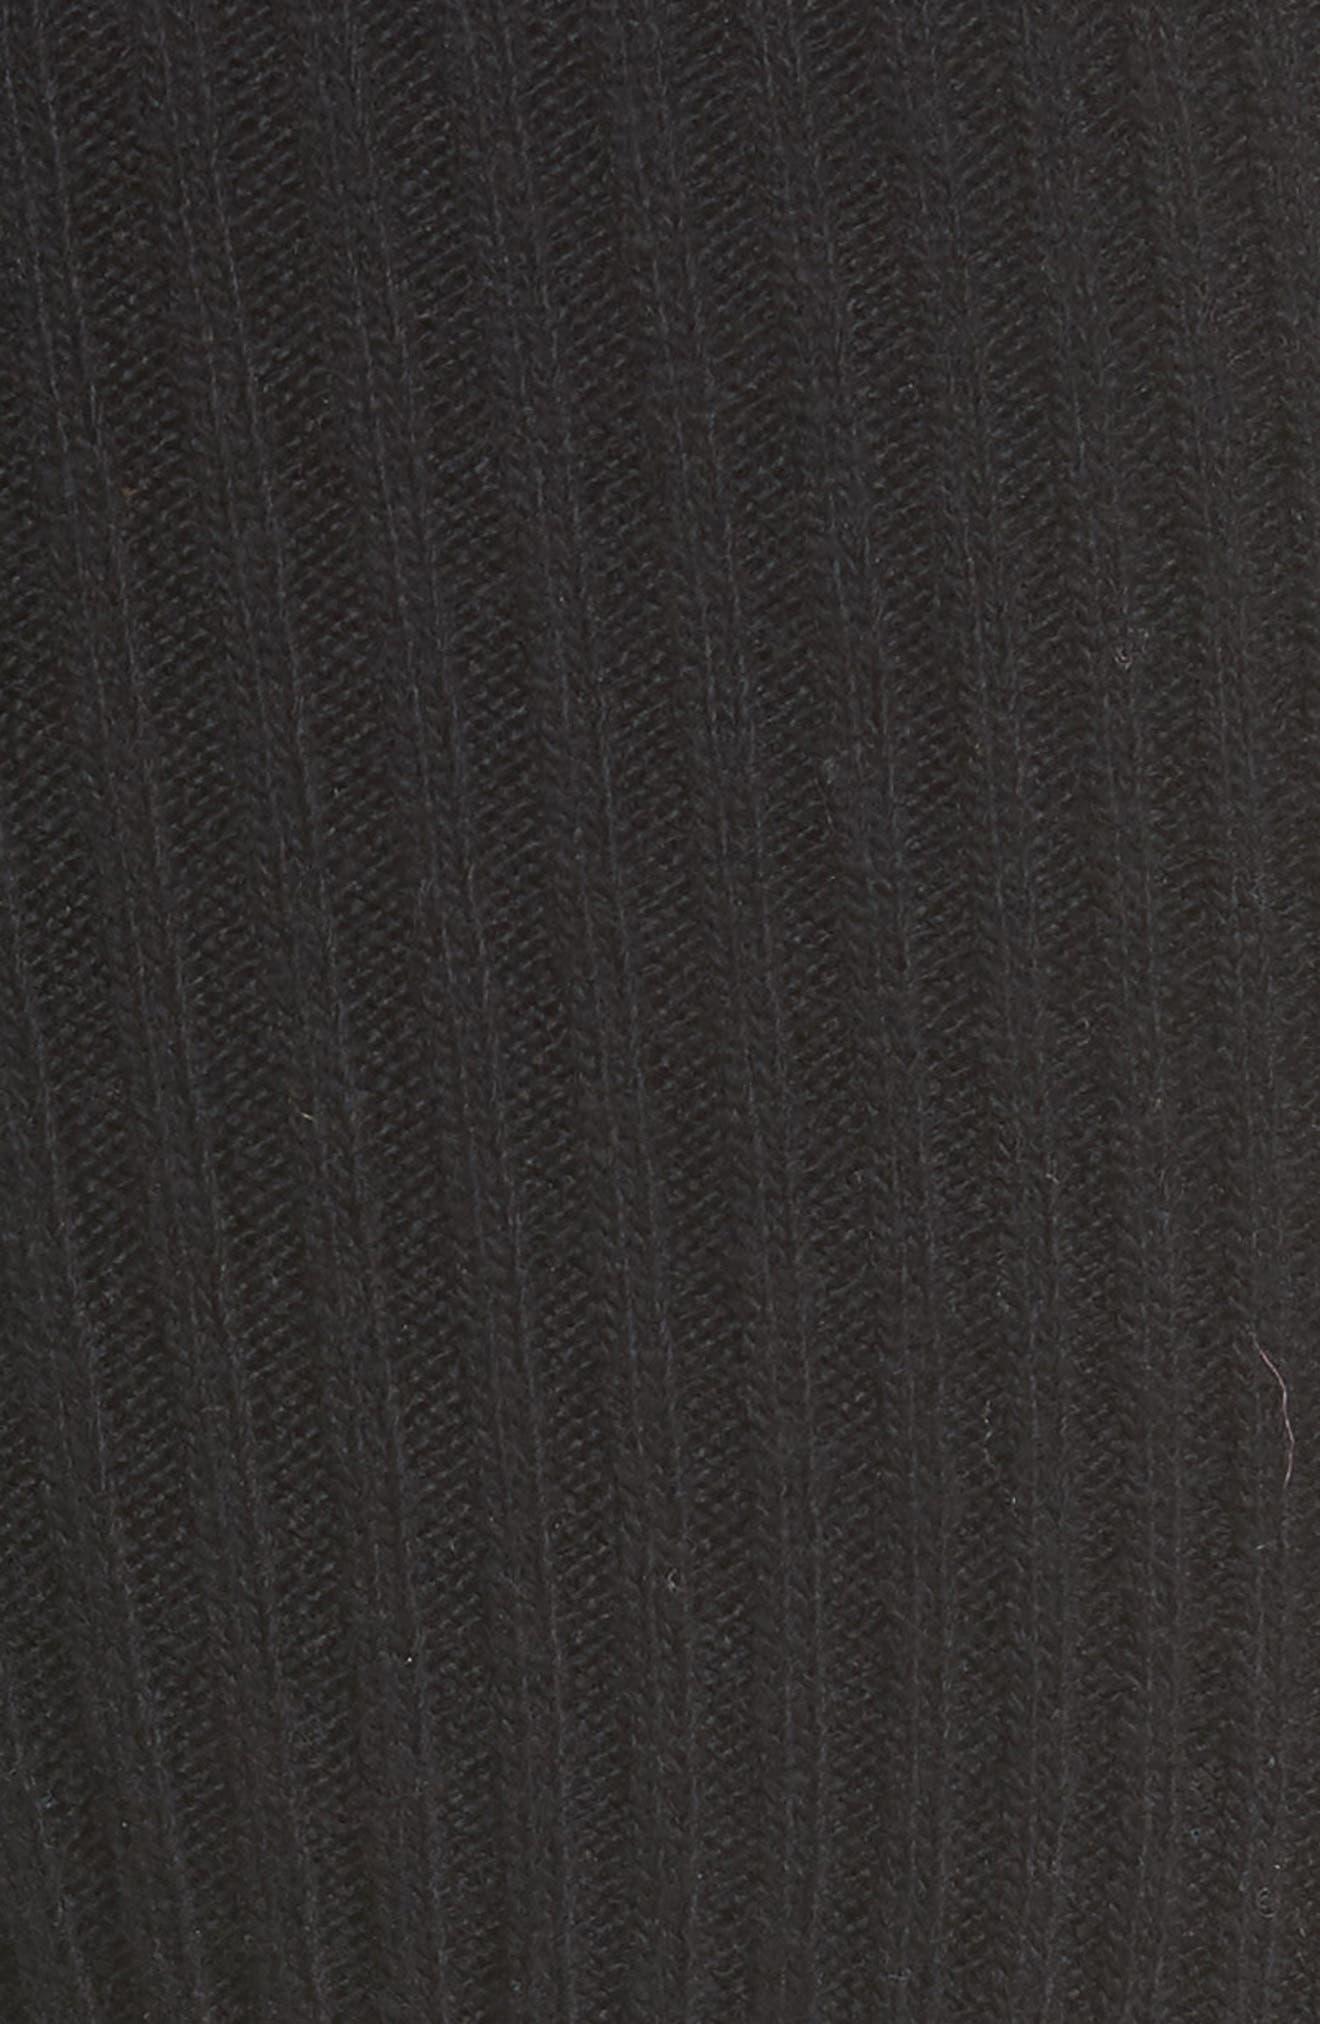 CALVIN KLEIN 205W39NYC,                             Side Stripe Stretch Wool Stirrup Leggings,                             Alternate thumbnail 5, color,                             001